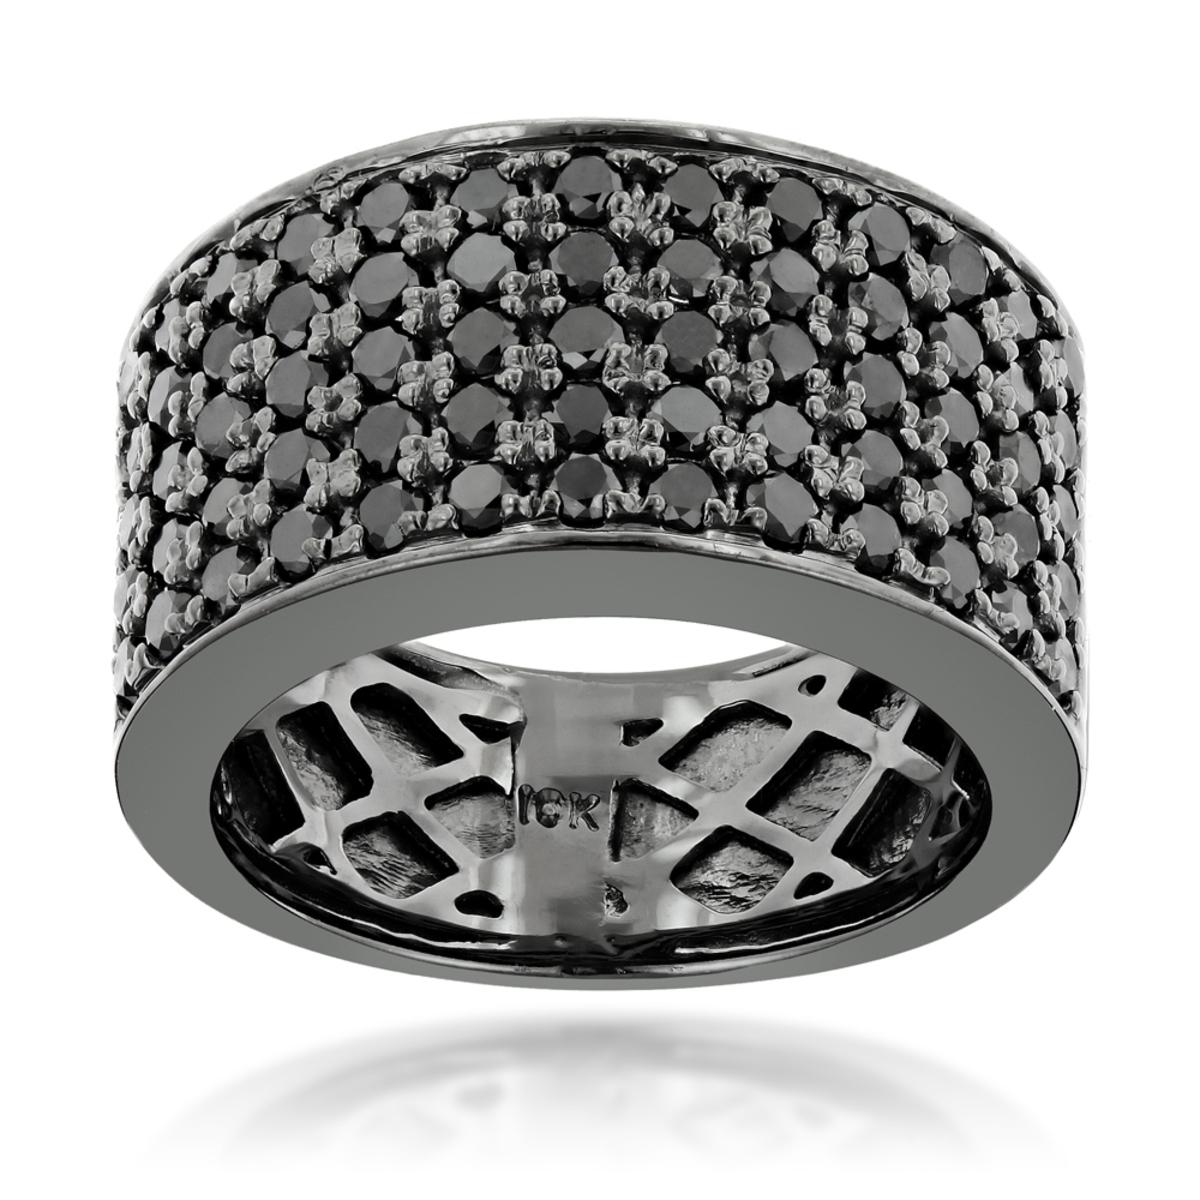 Designer 10K Gold Black Diamond Wedding Band for Men 1.67ct Luxurman Ring